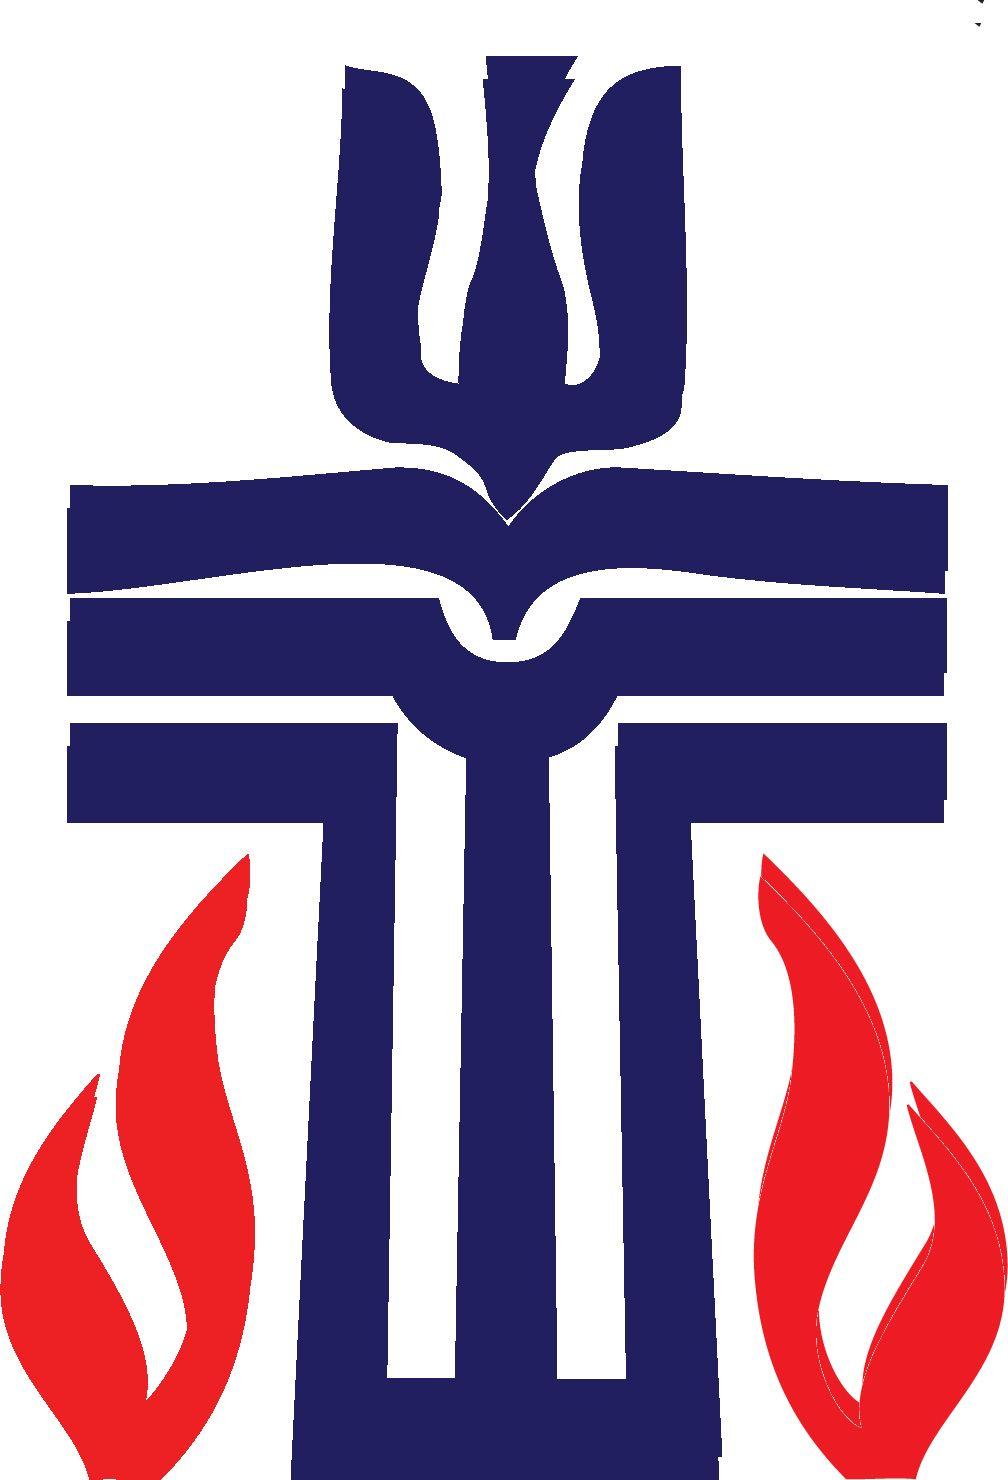 Photo presbyterian church presbyterian church this churchs logo is photo presbyterian church presbyterian church this churchs logo is brimming with symbolism there are buycottarizona Image collections